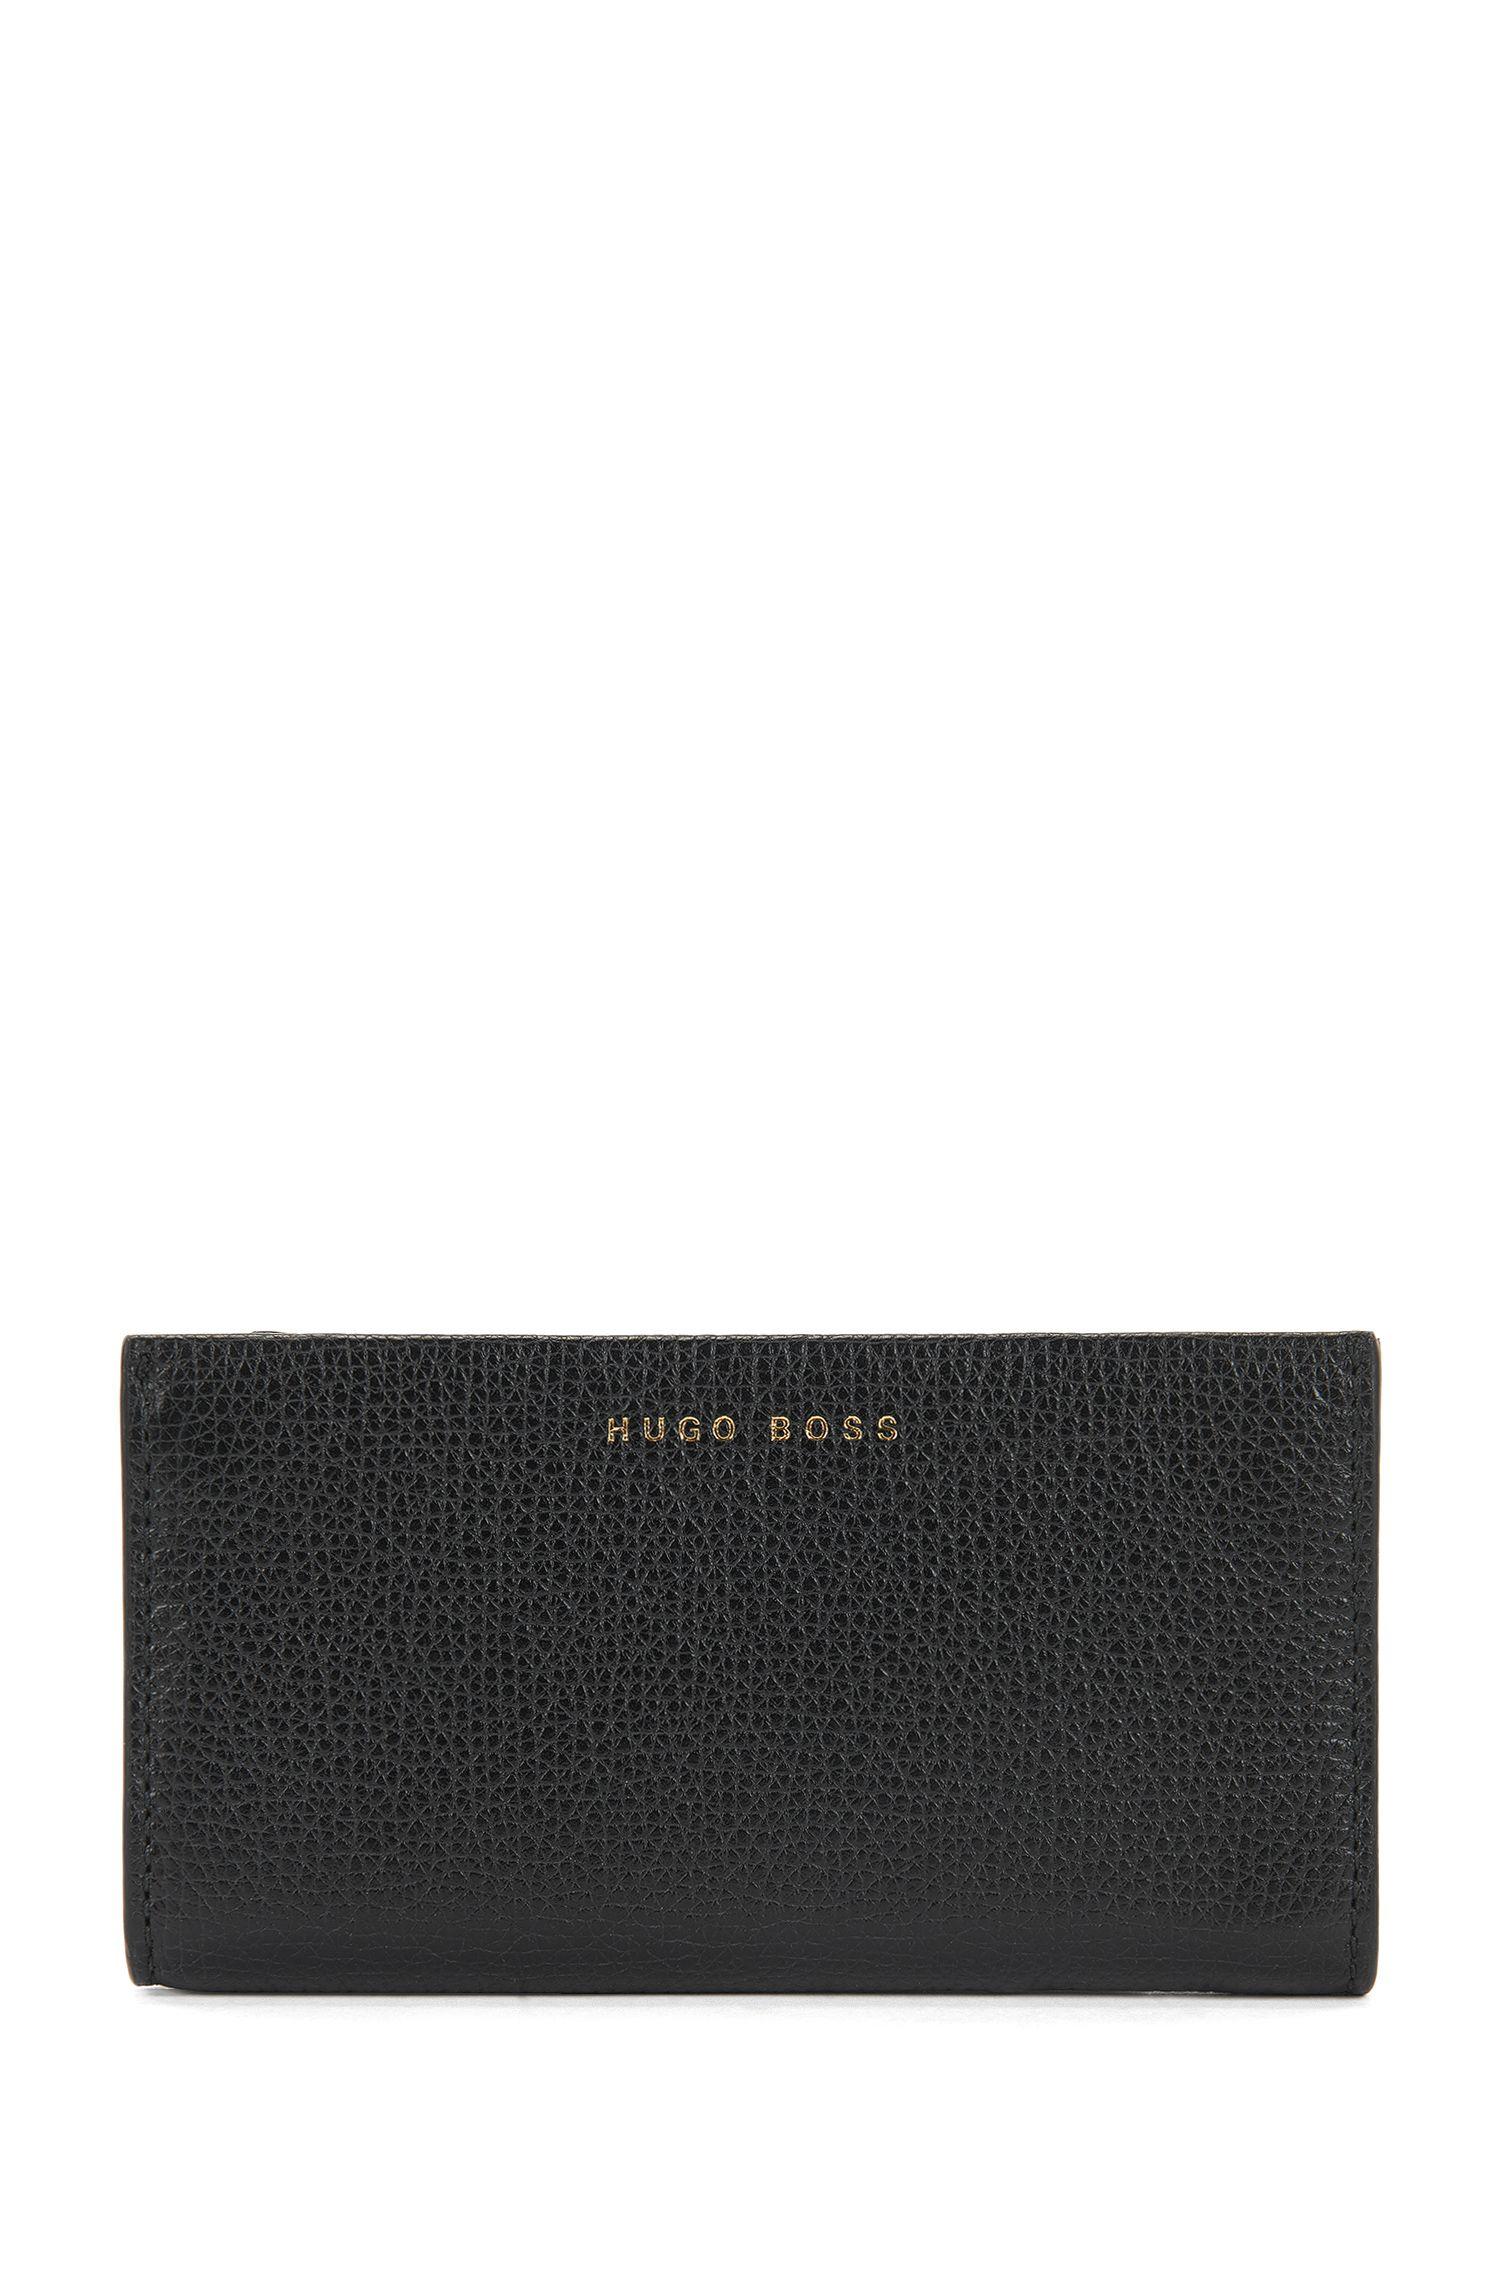 Key holder in grained Italian leather